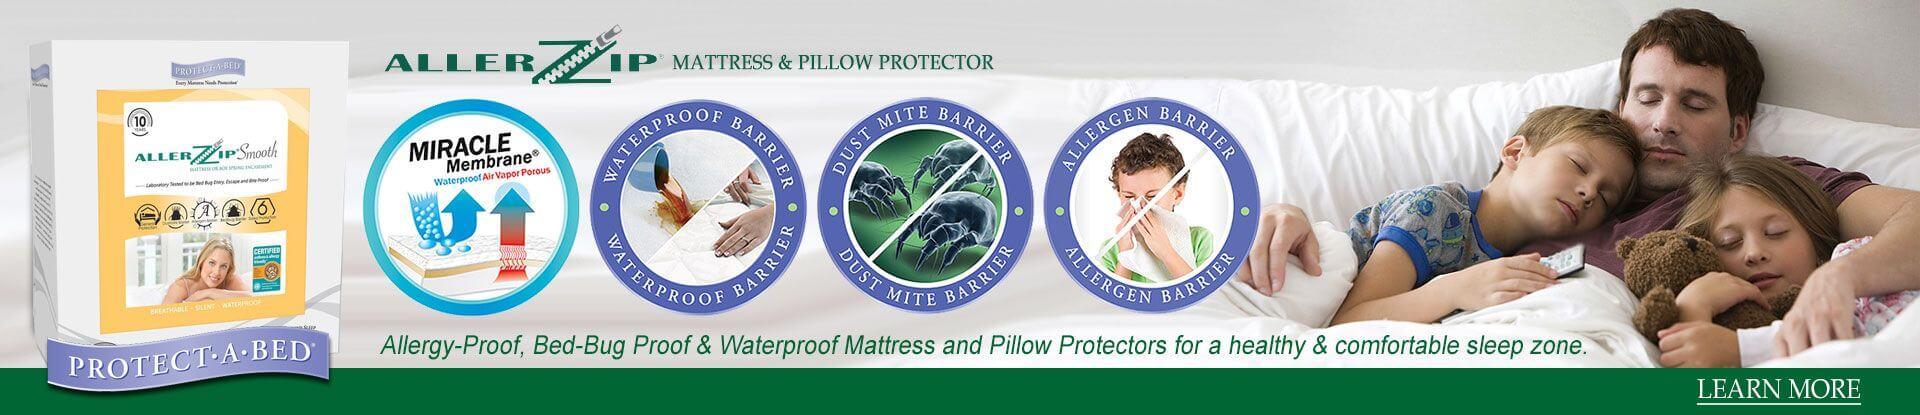 AllerZip Smooth Mattress Protector, Anti-Allergy & Bed Bug